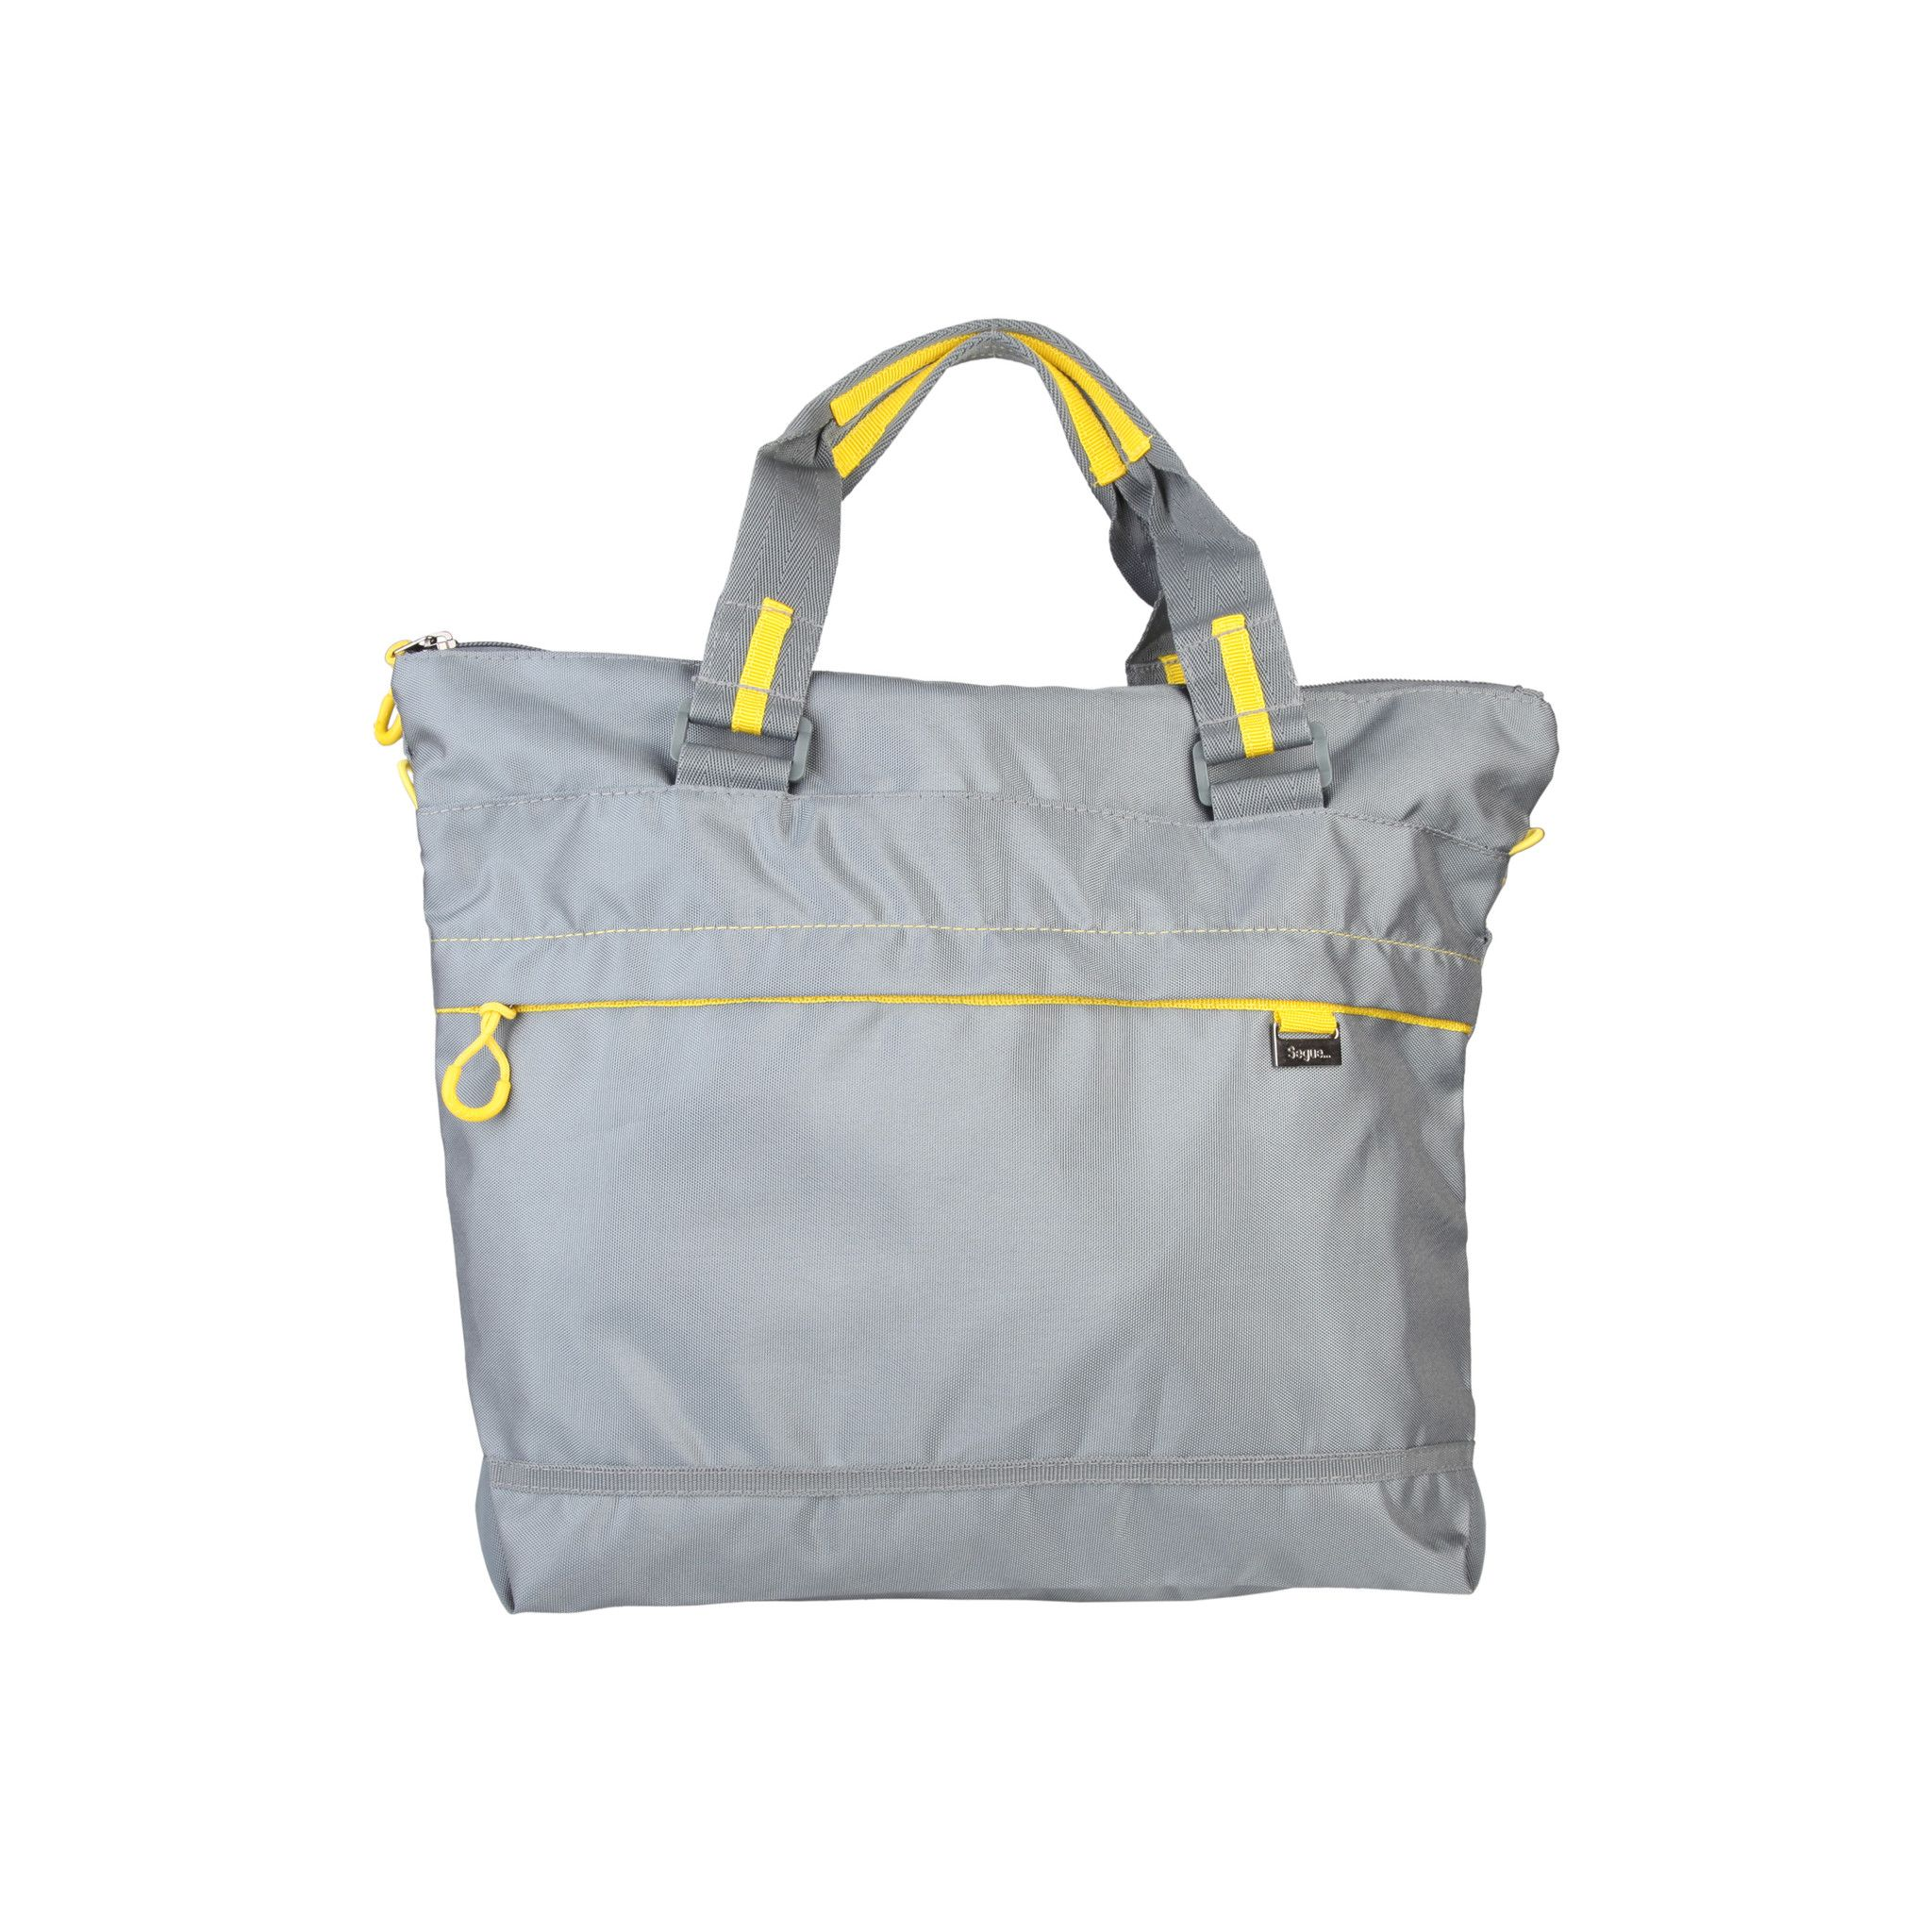 272532562a Segue bags On Sale  clothing  fashion  women  Bags  Handbags ...